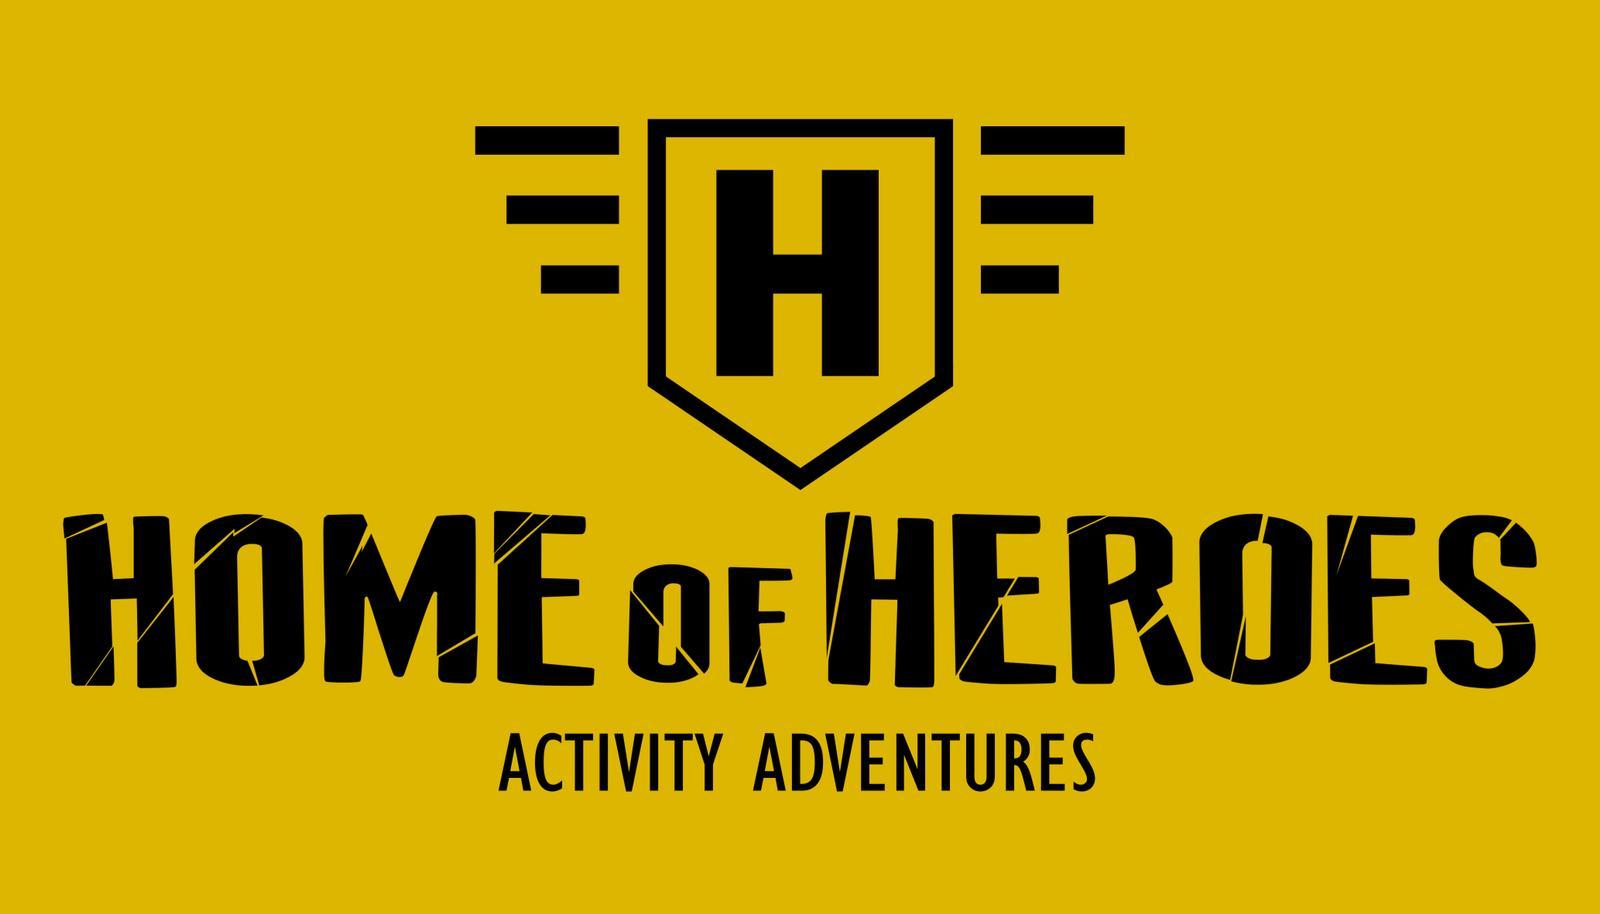 Home of Heroes